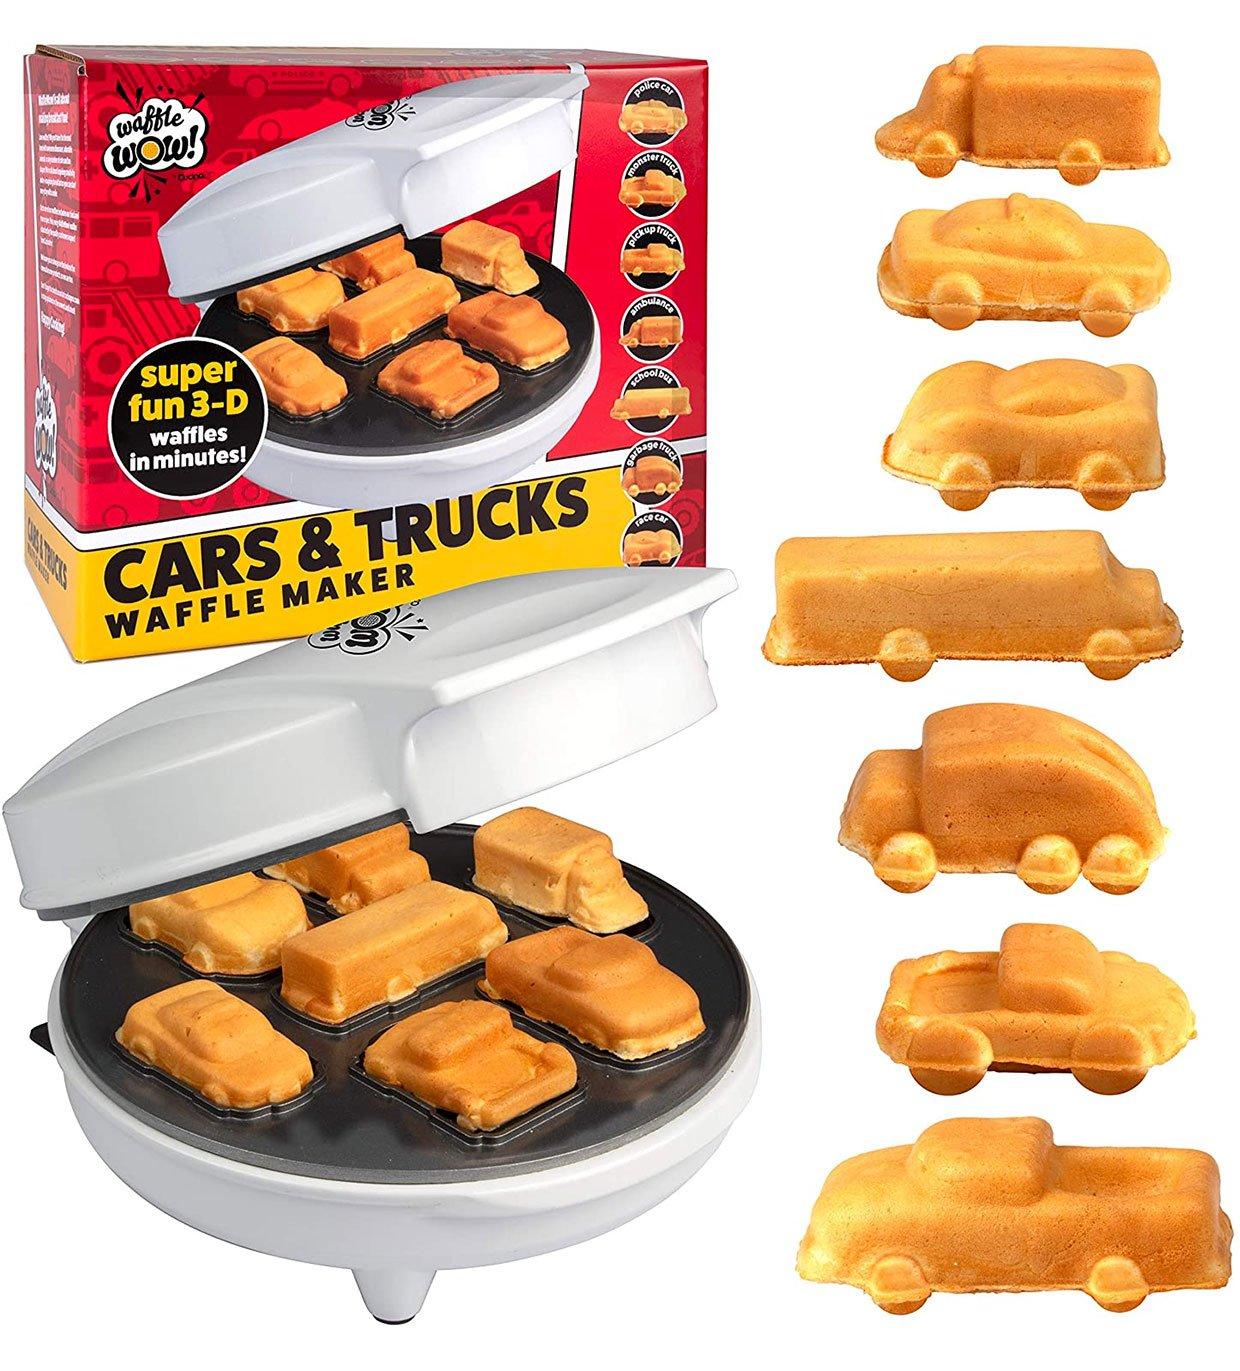 Cars & Trucks Waffle Maker